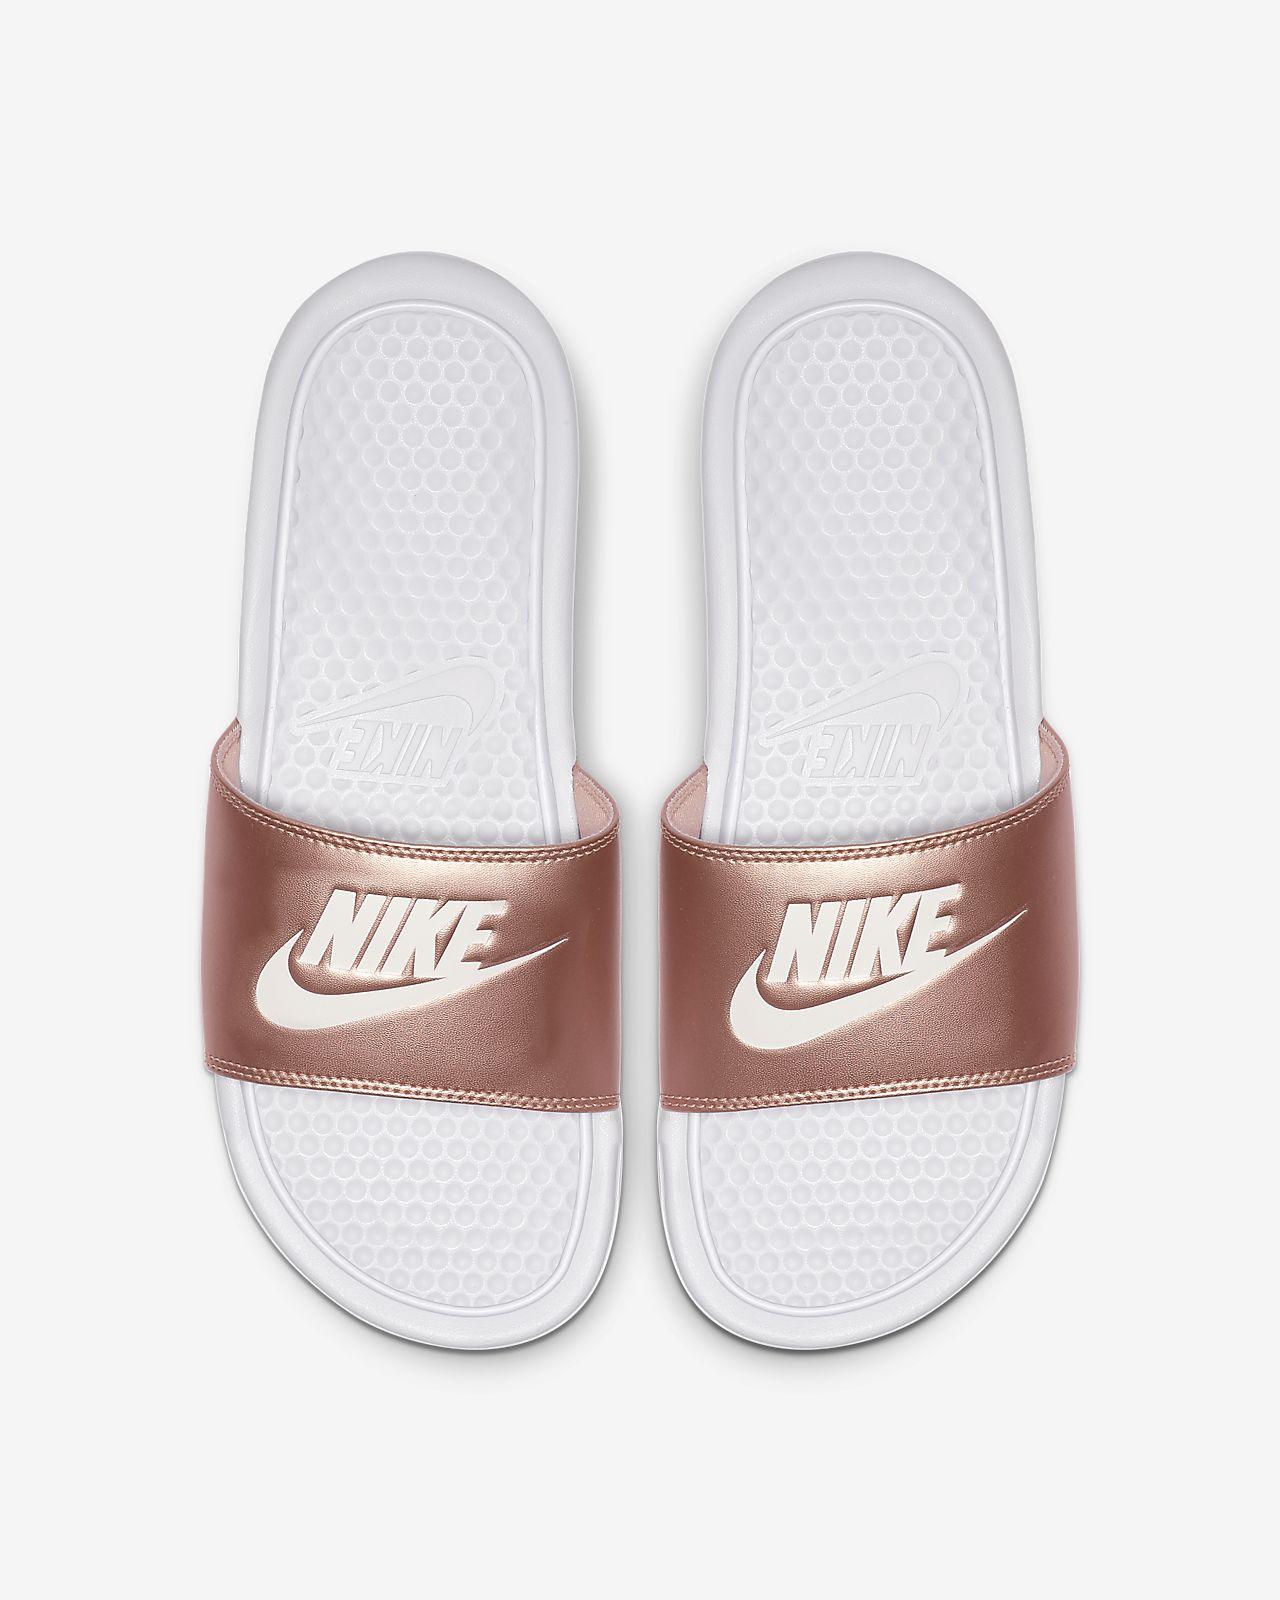 0059aeb69 Nike Benassi Women s Slide. Nike.com VN